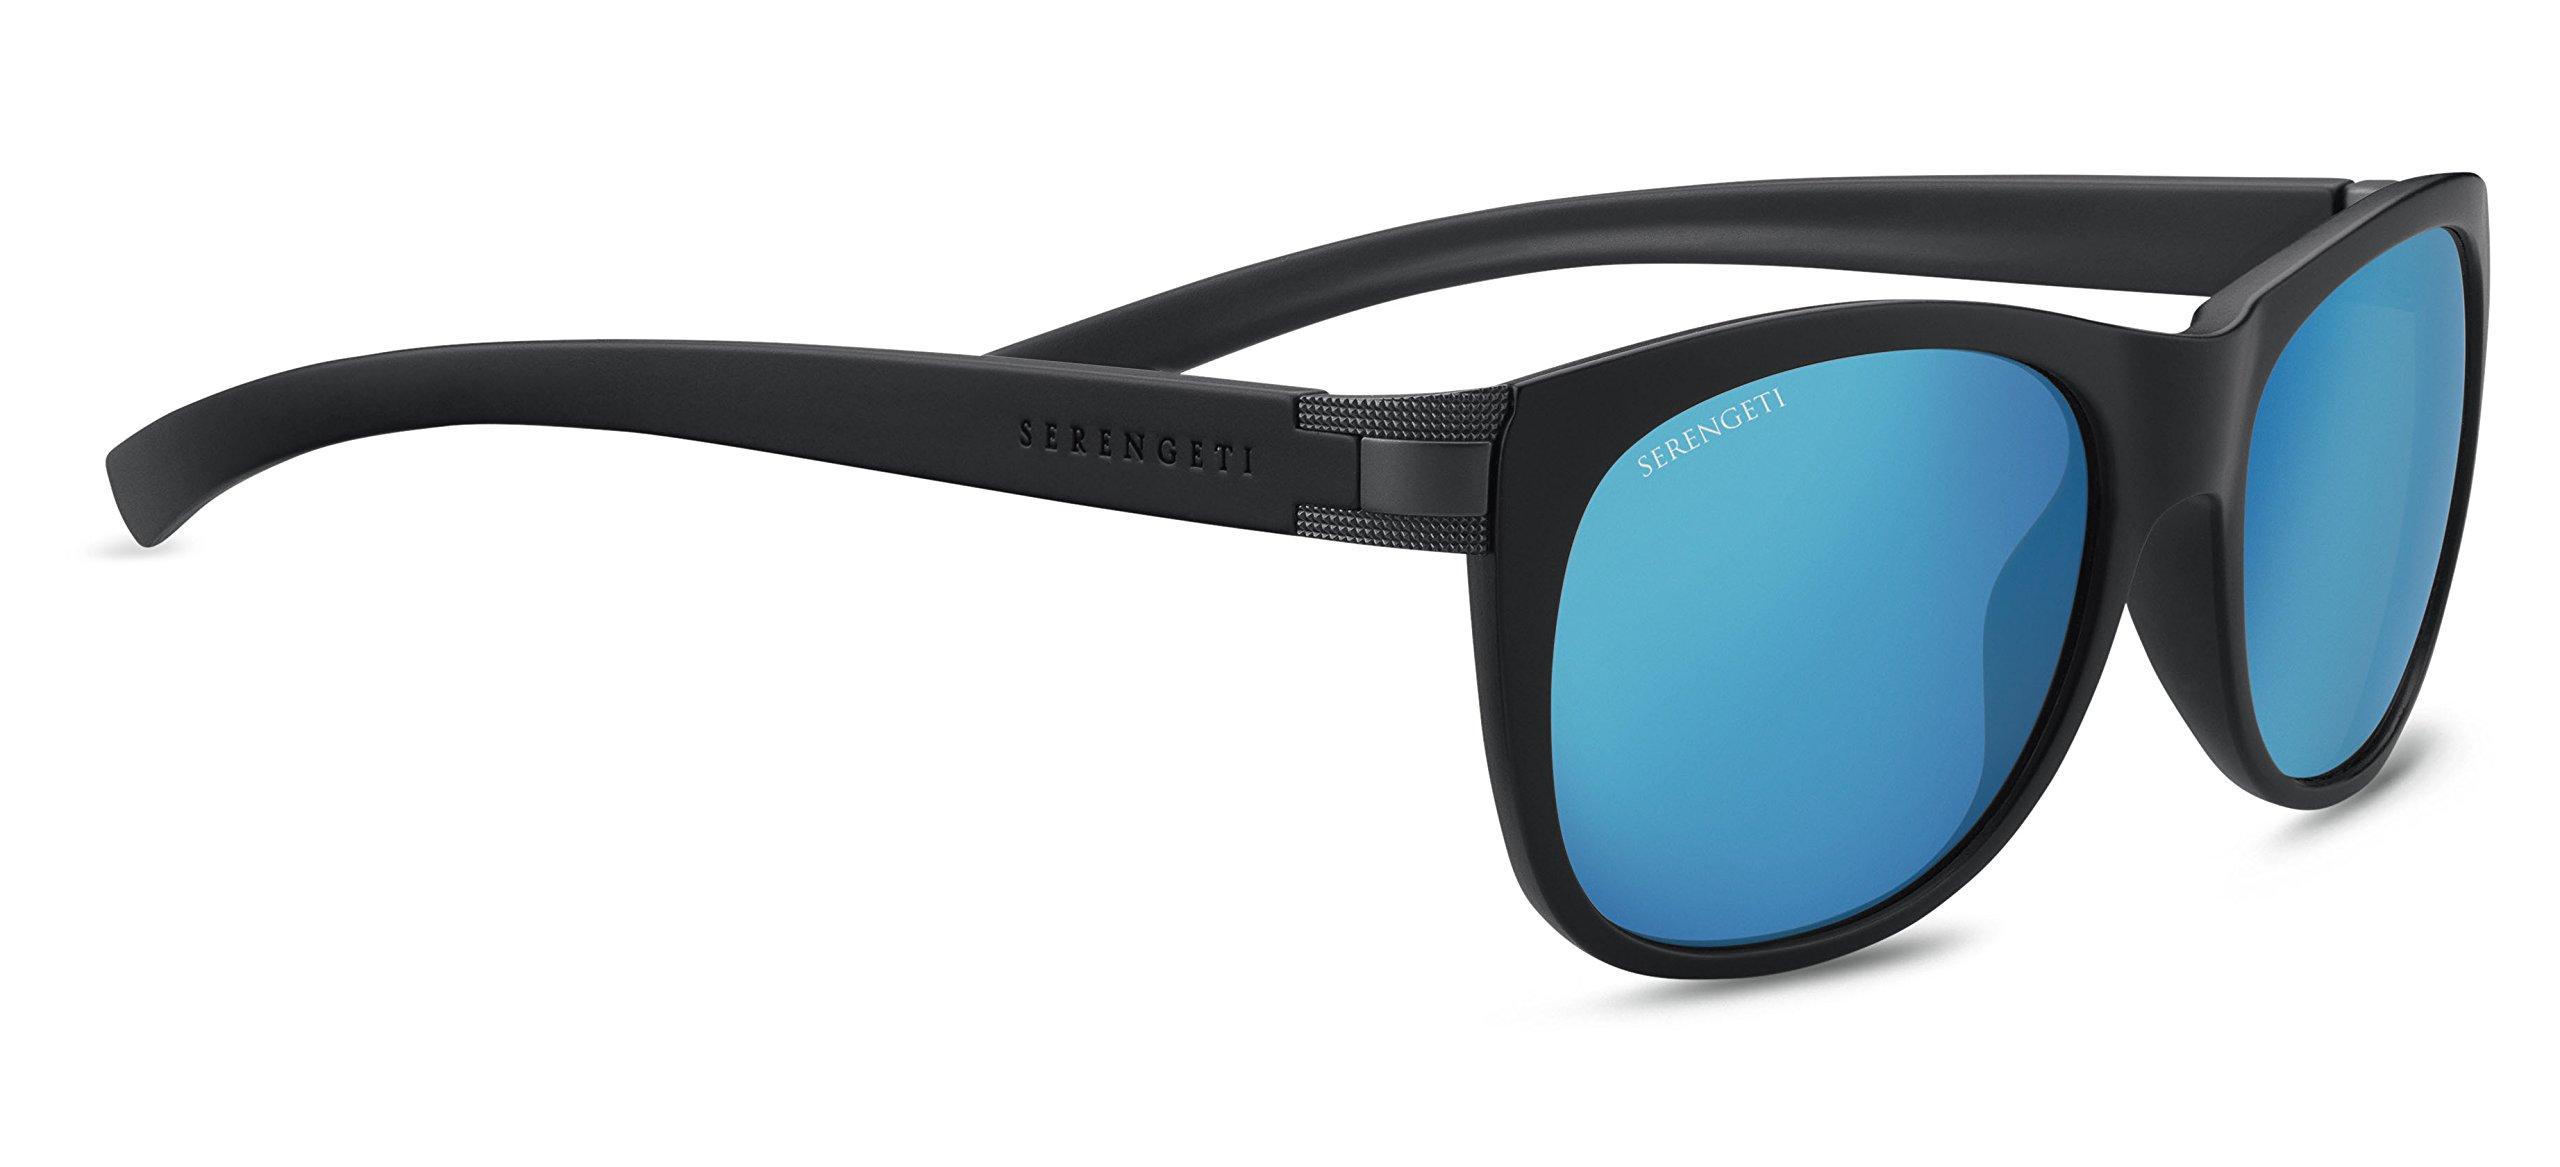 Serengeti Scala Sunglasses Sanded Black/Satin Dark Gunmetal, Blue